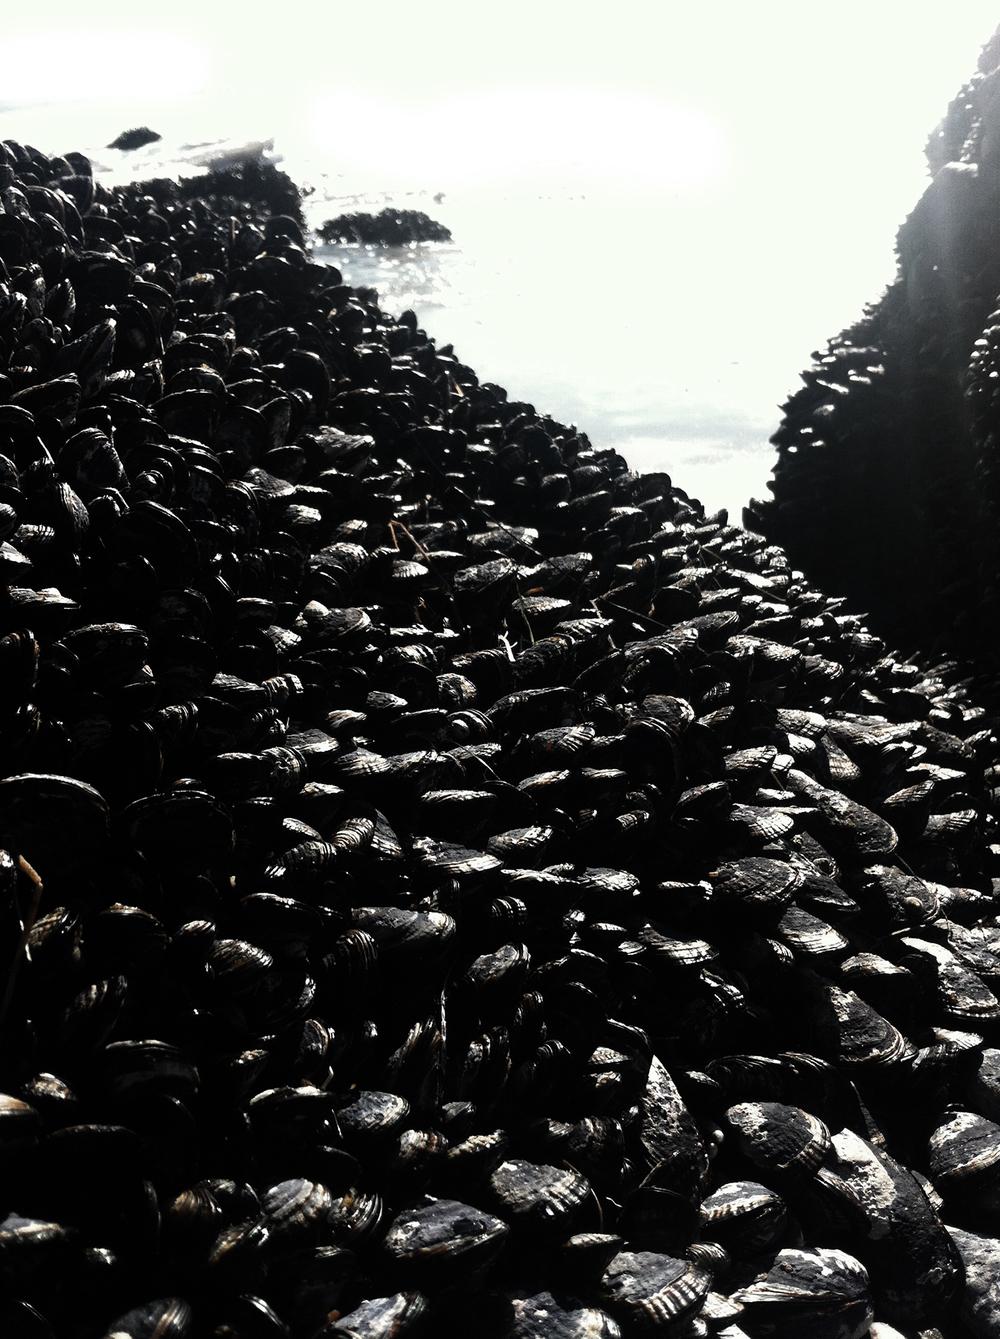 Mussels-1920.jpg